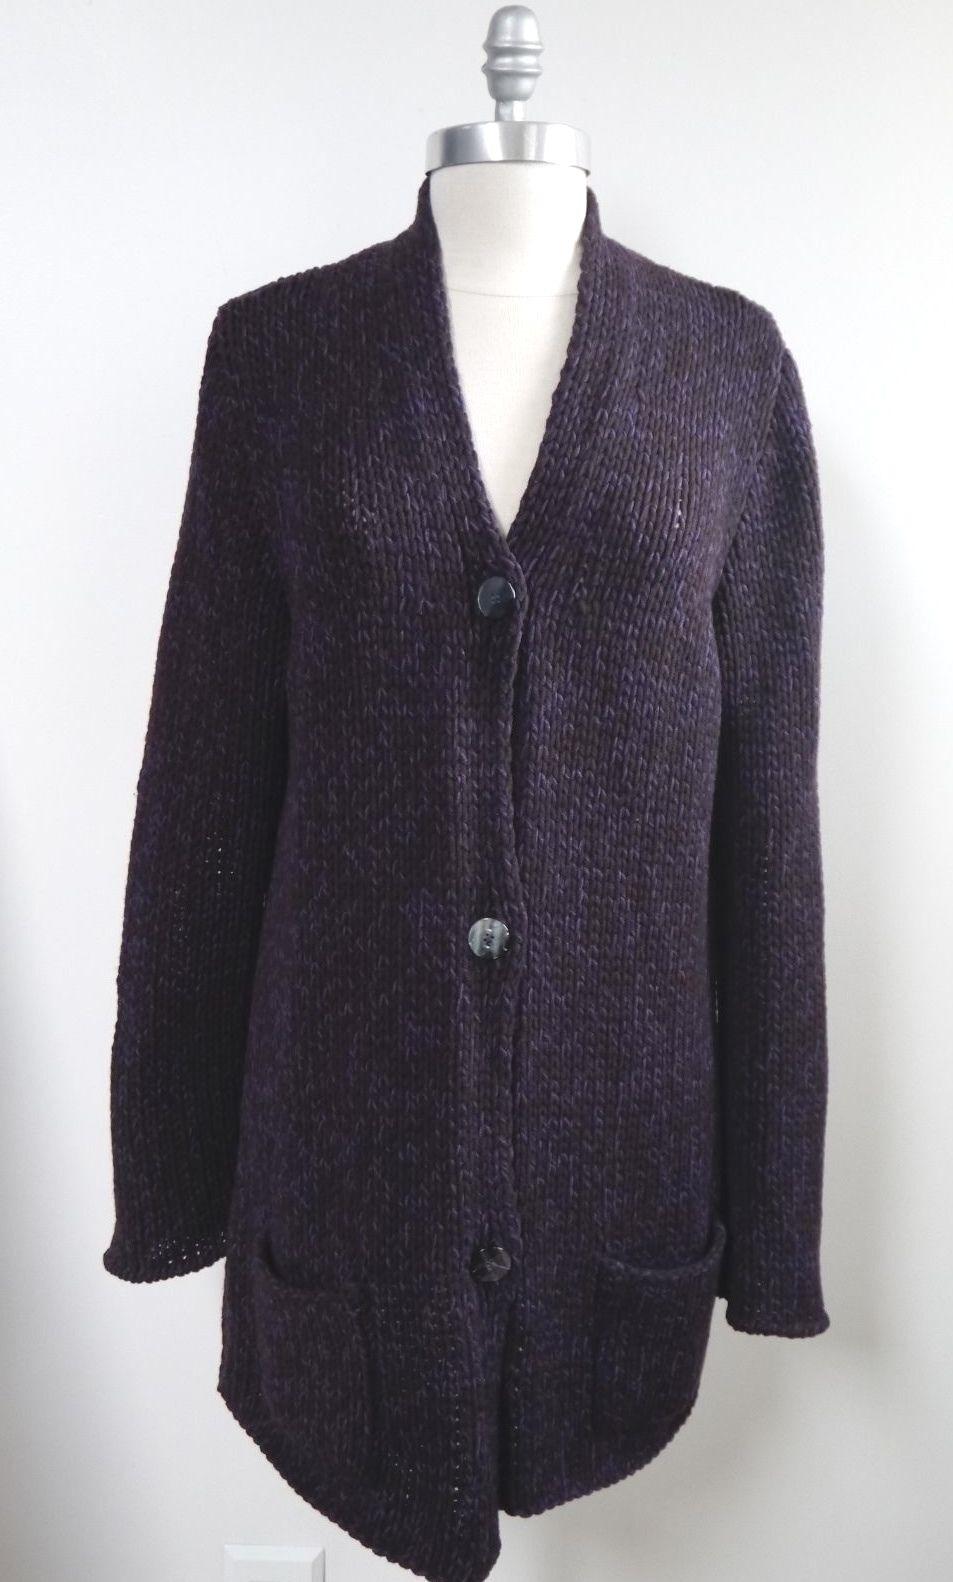 RIVAMONTI by Brunello Cucinelli chunky wool silk blend long cardigan sweater XL